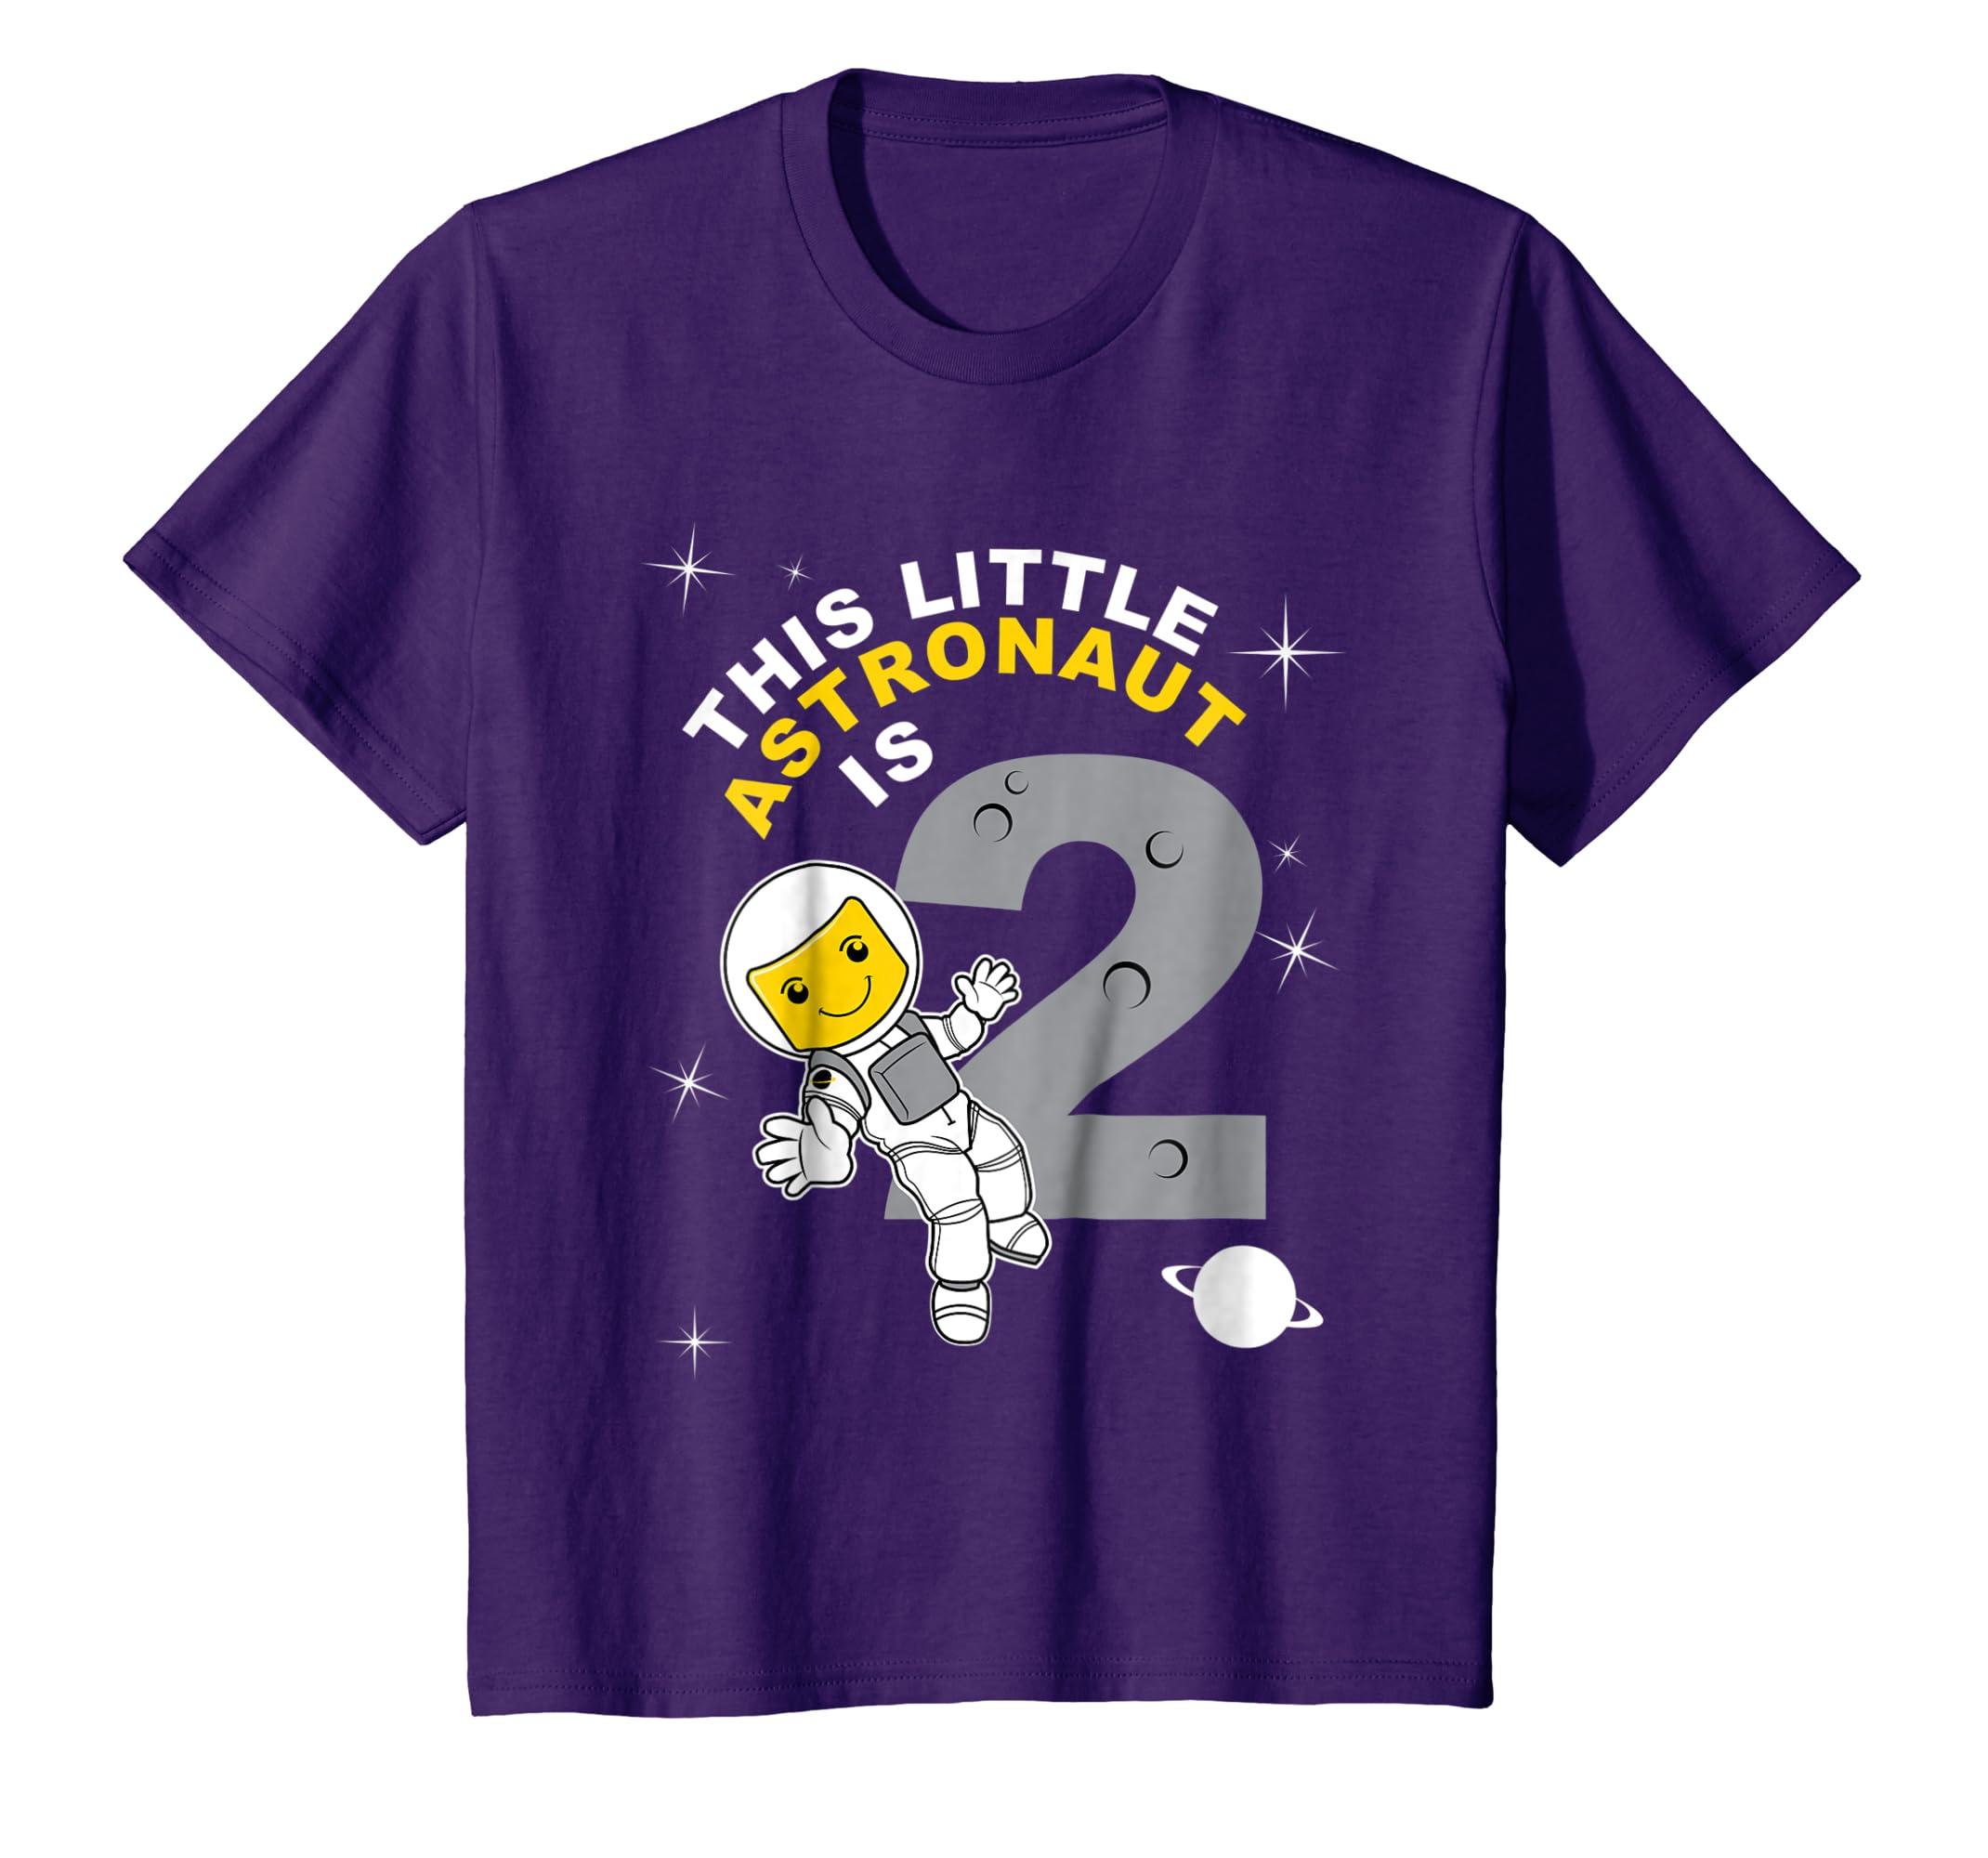 Amazon Kids 2nd Birthday Girls Astronaut T Shirt Space 2 Year Old Clothing